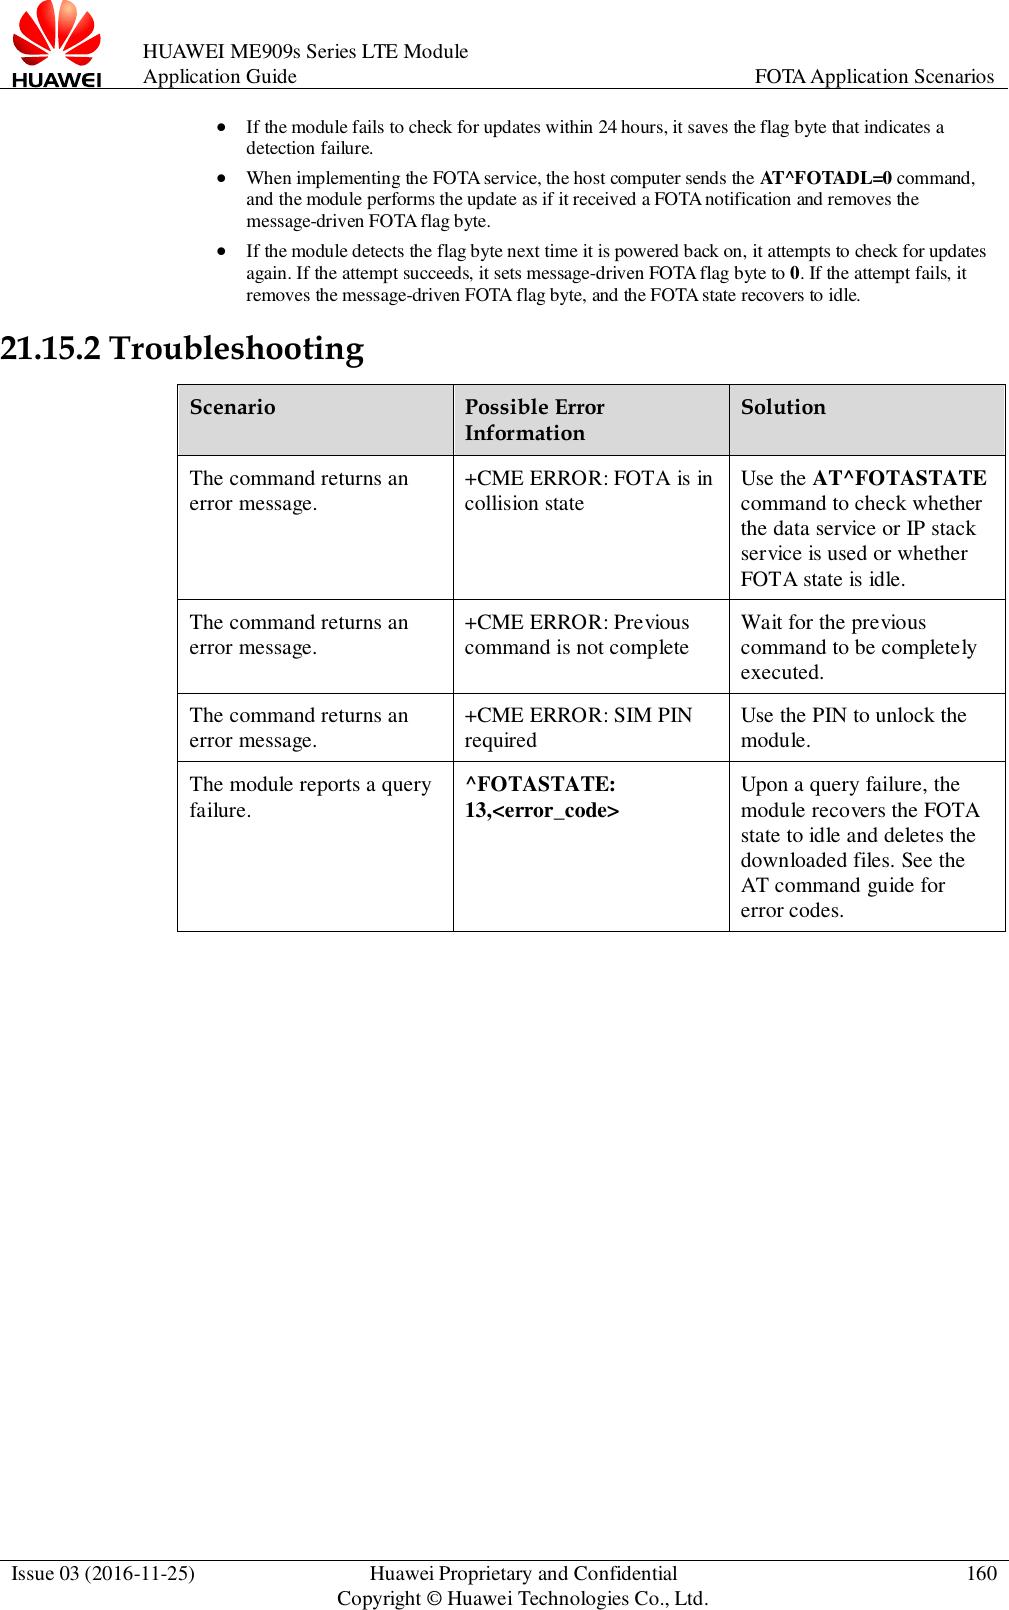 Huawei ME909s Series LTE Module Application Guide (V100R001 03, English)